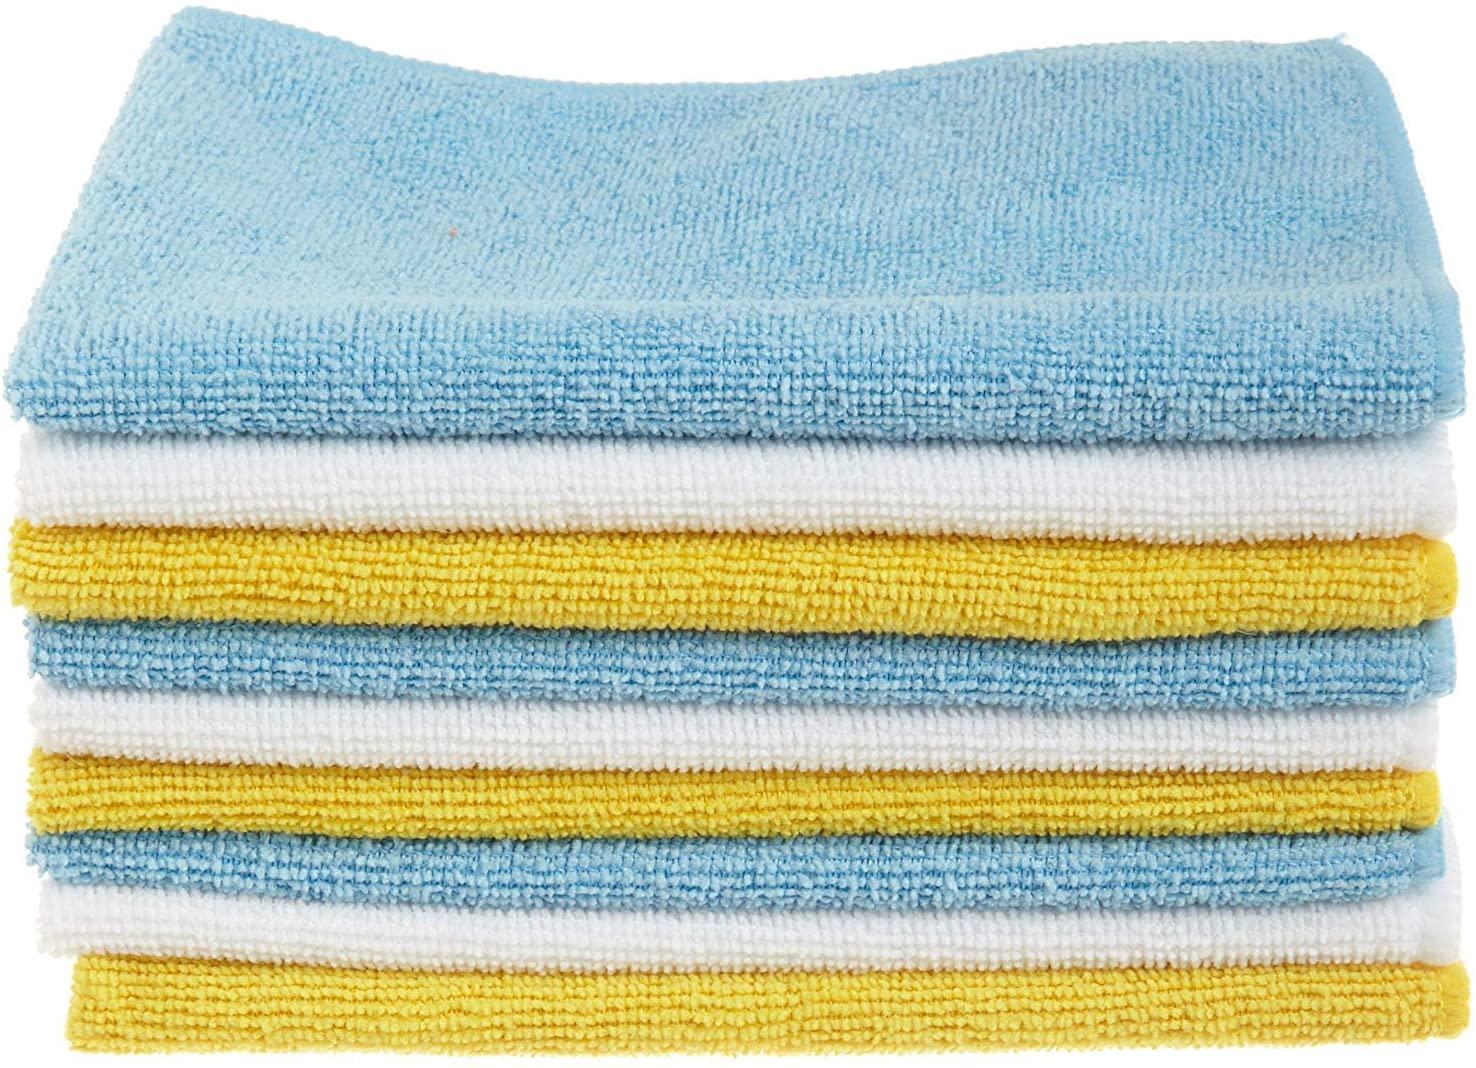 Amazon Basics Microfiber Cleaning Cloth